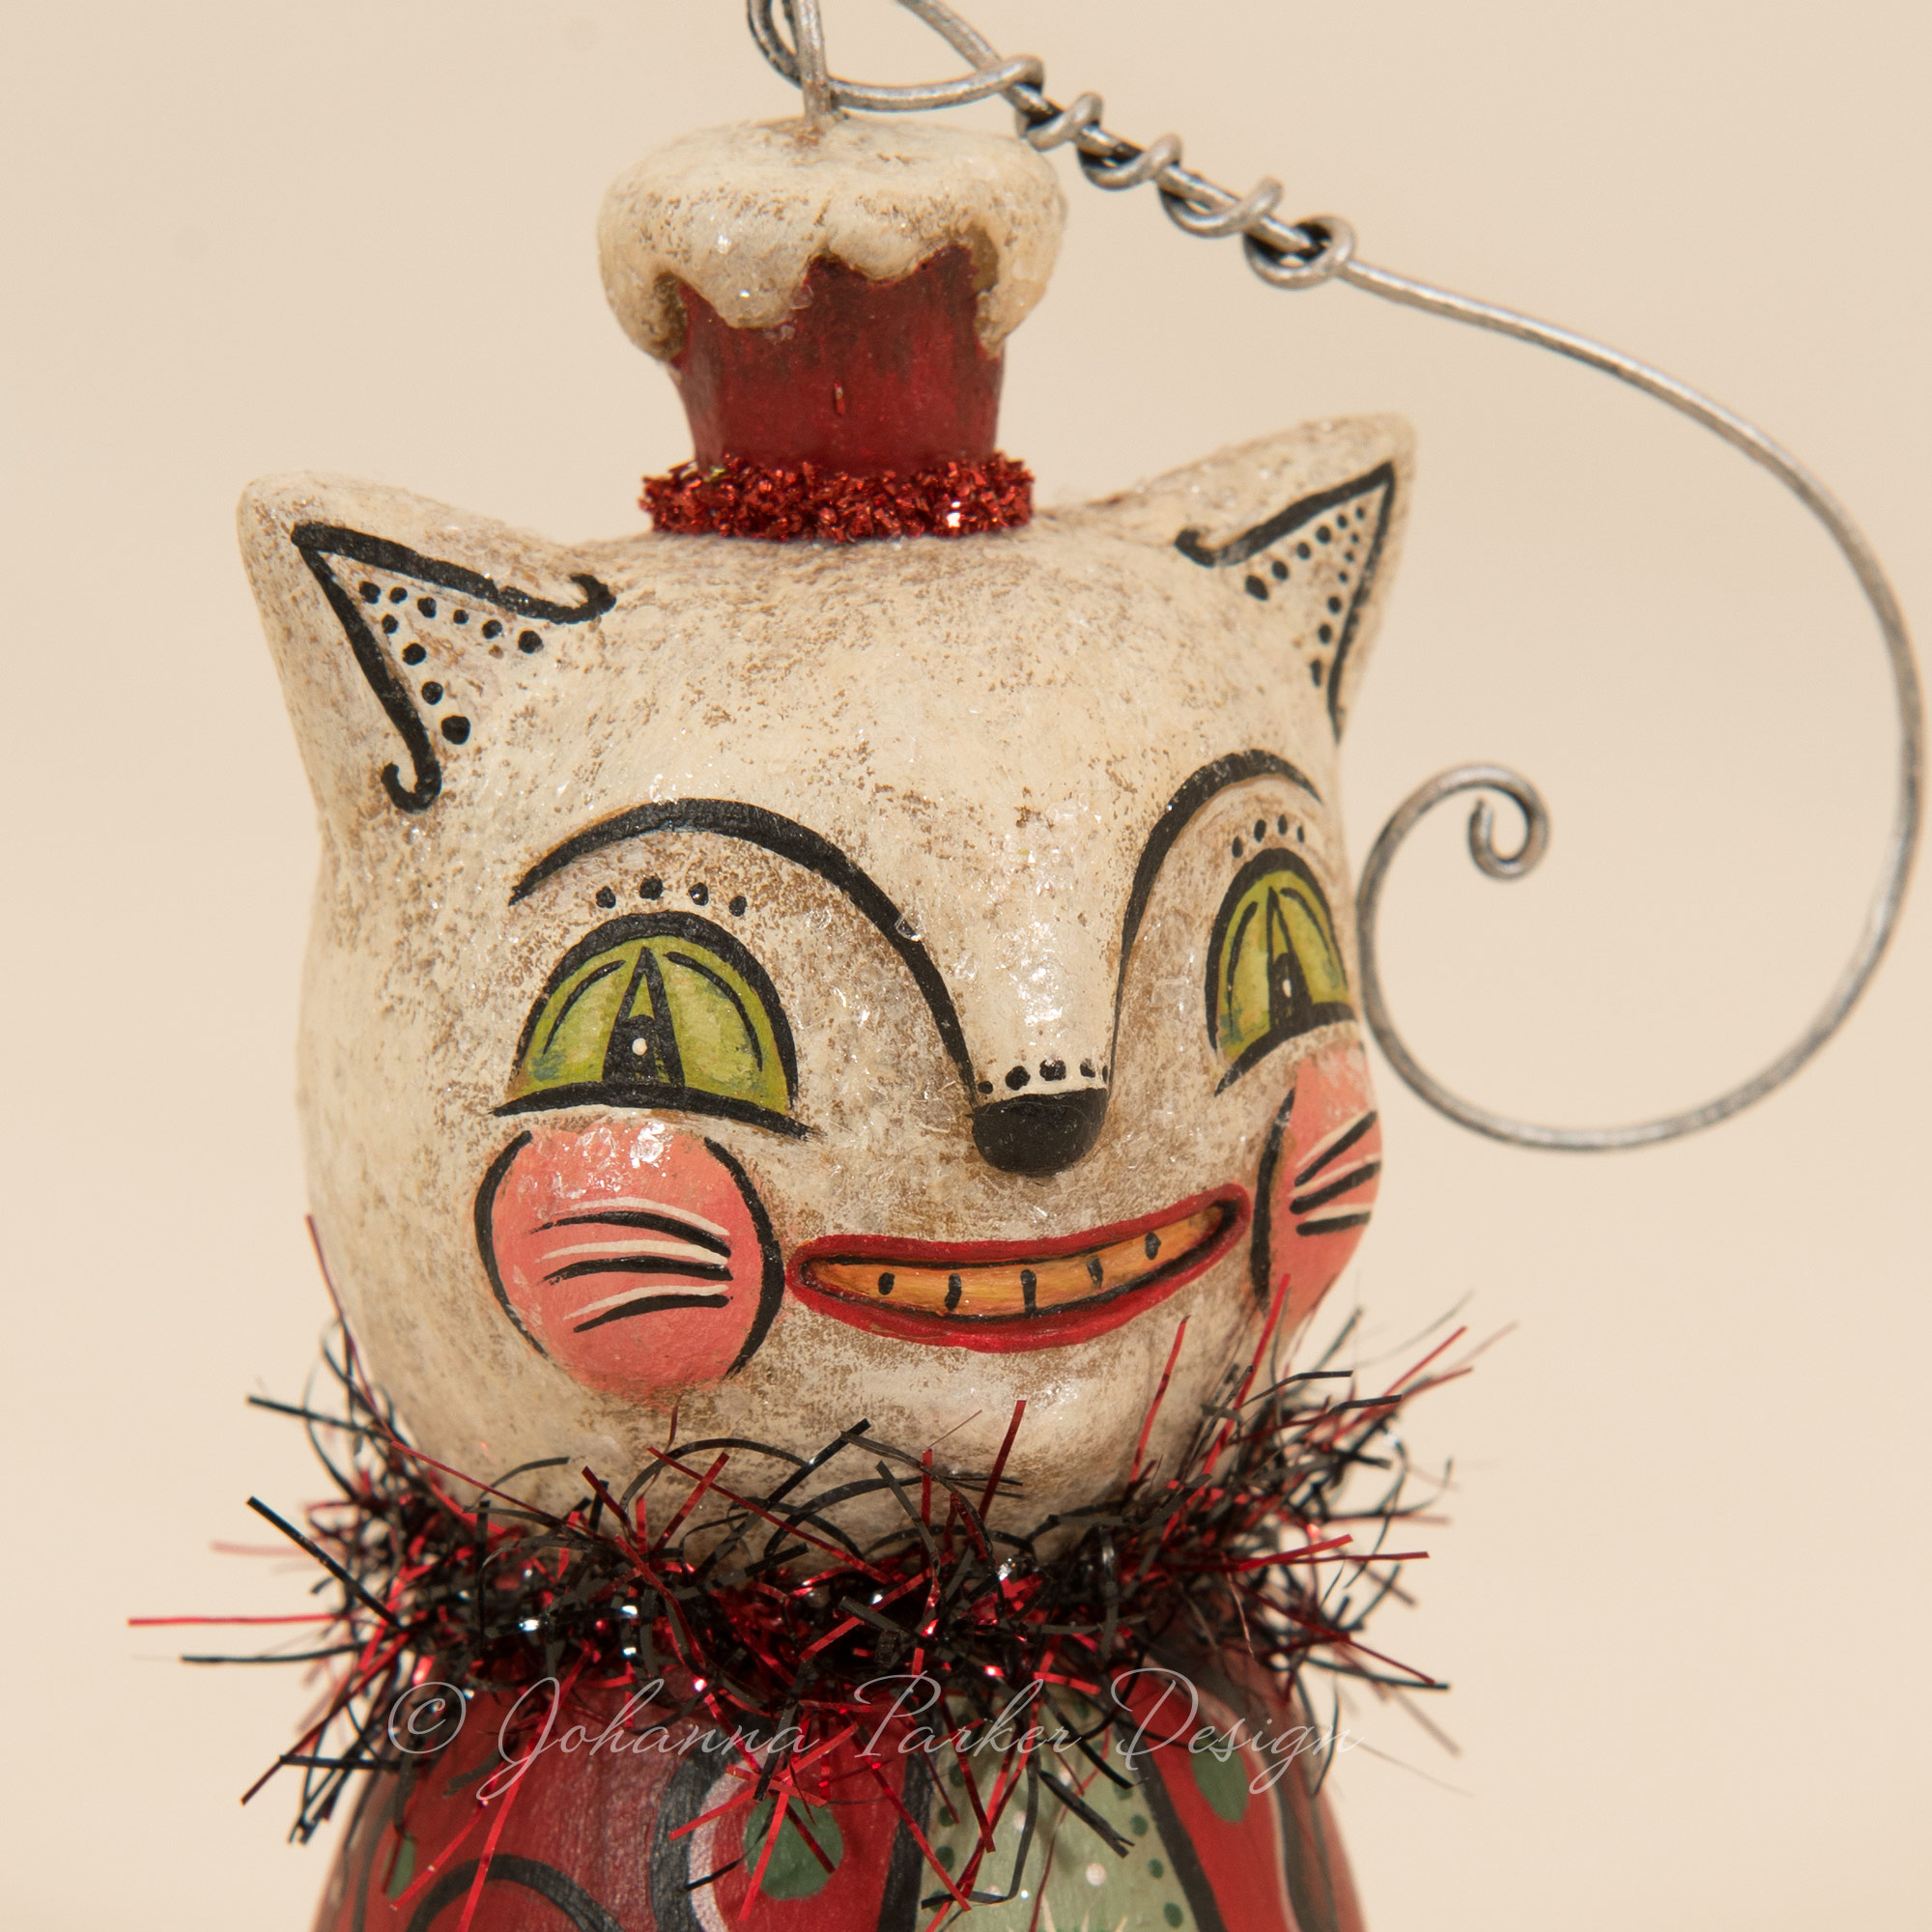 Johanna-Parker-Frosty-Grinning-Cat-Bell-Ornament-2.jpg